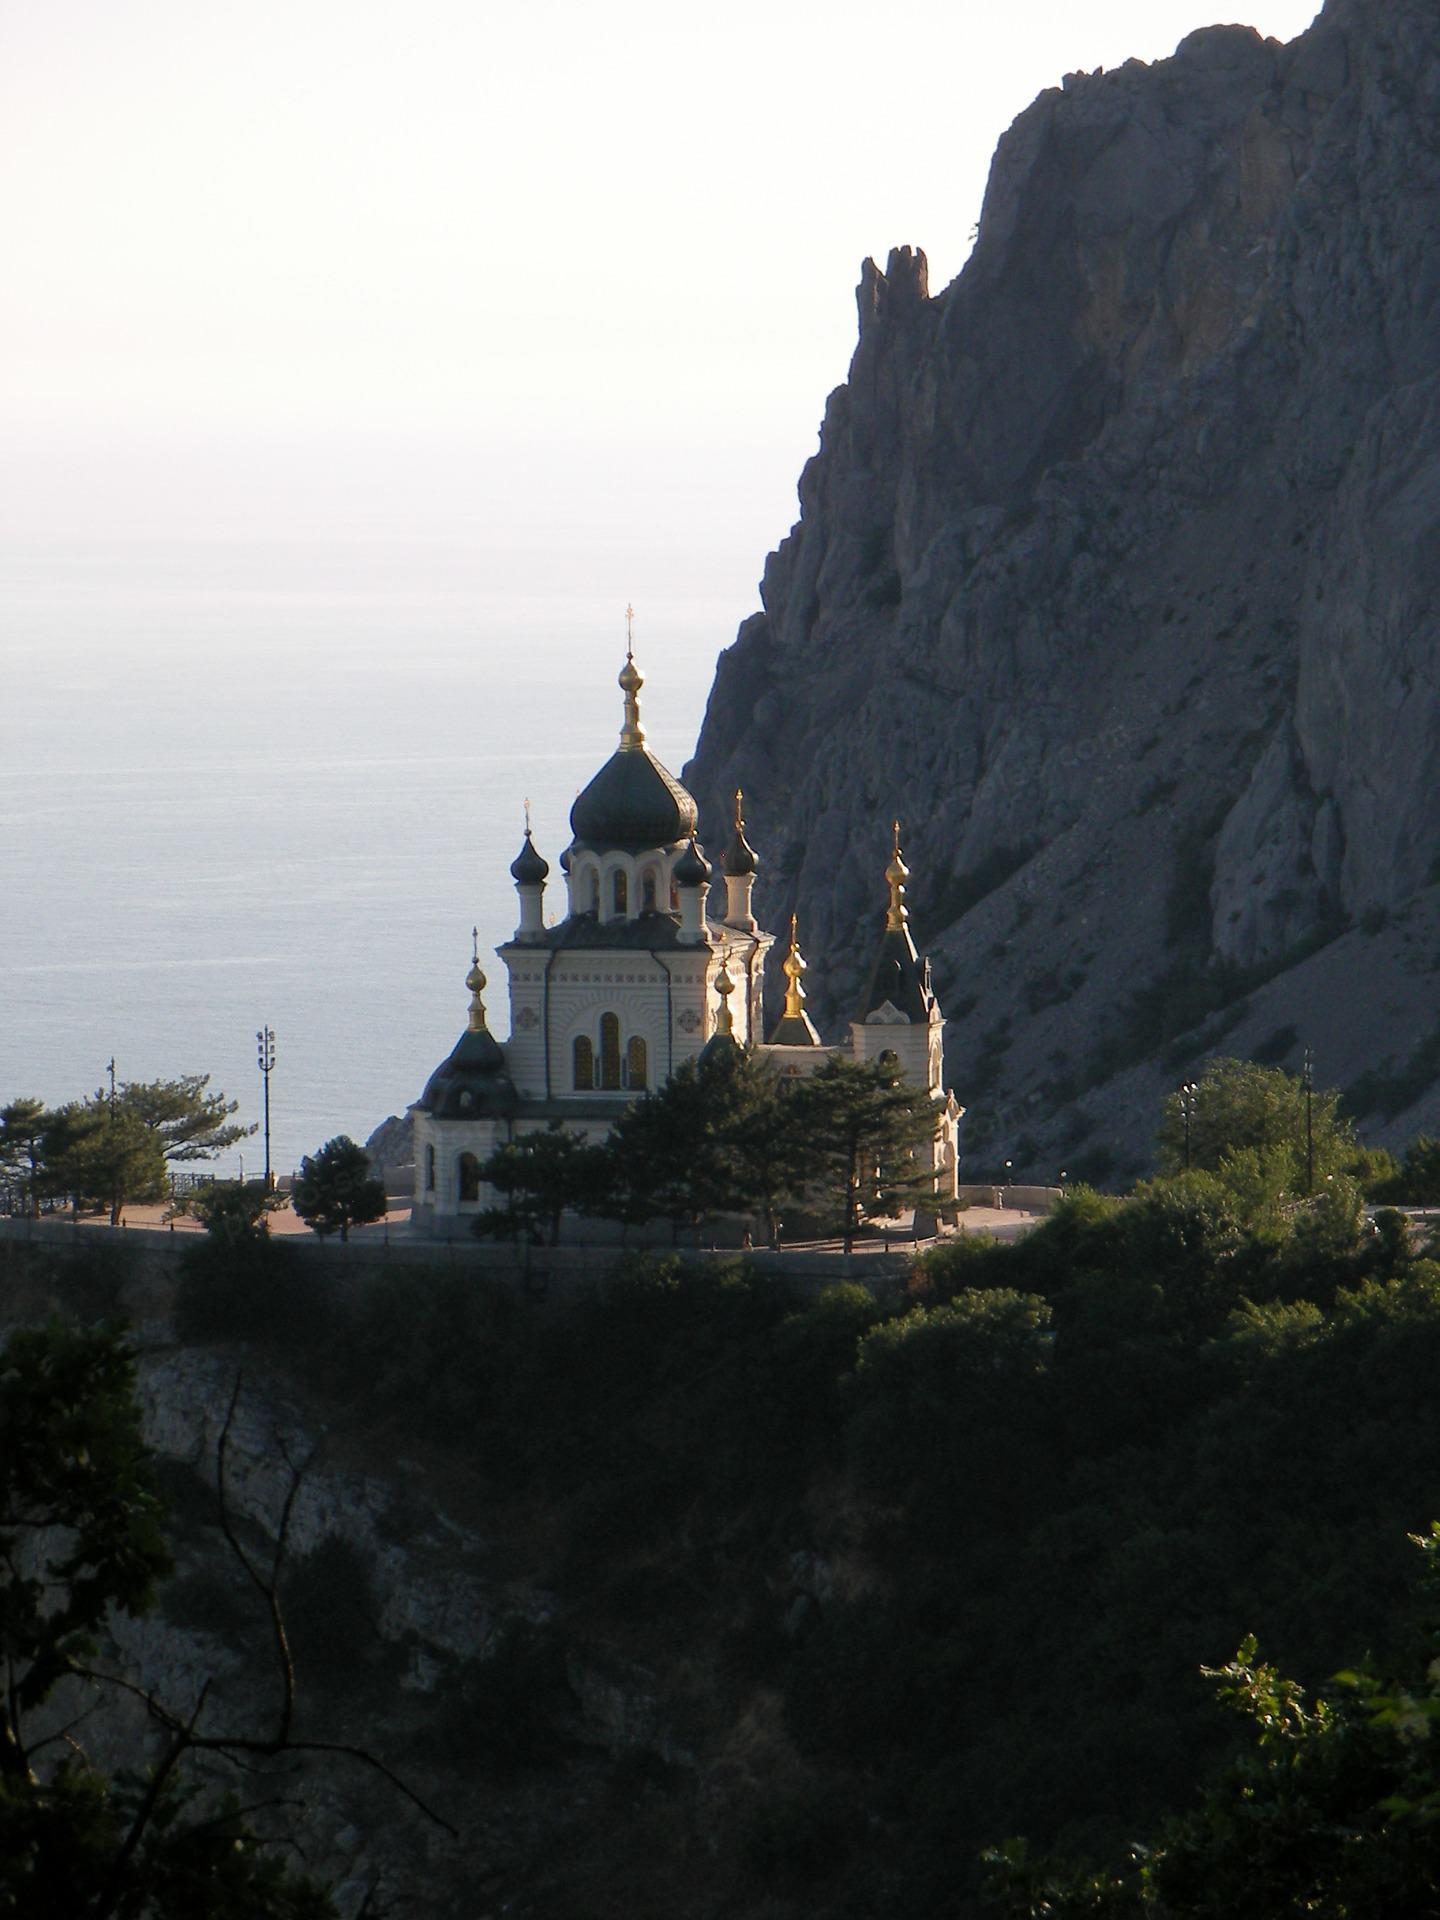 Church sa mga bundok na malapit sa Foros sa Krimea